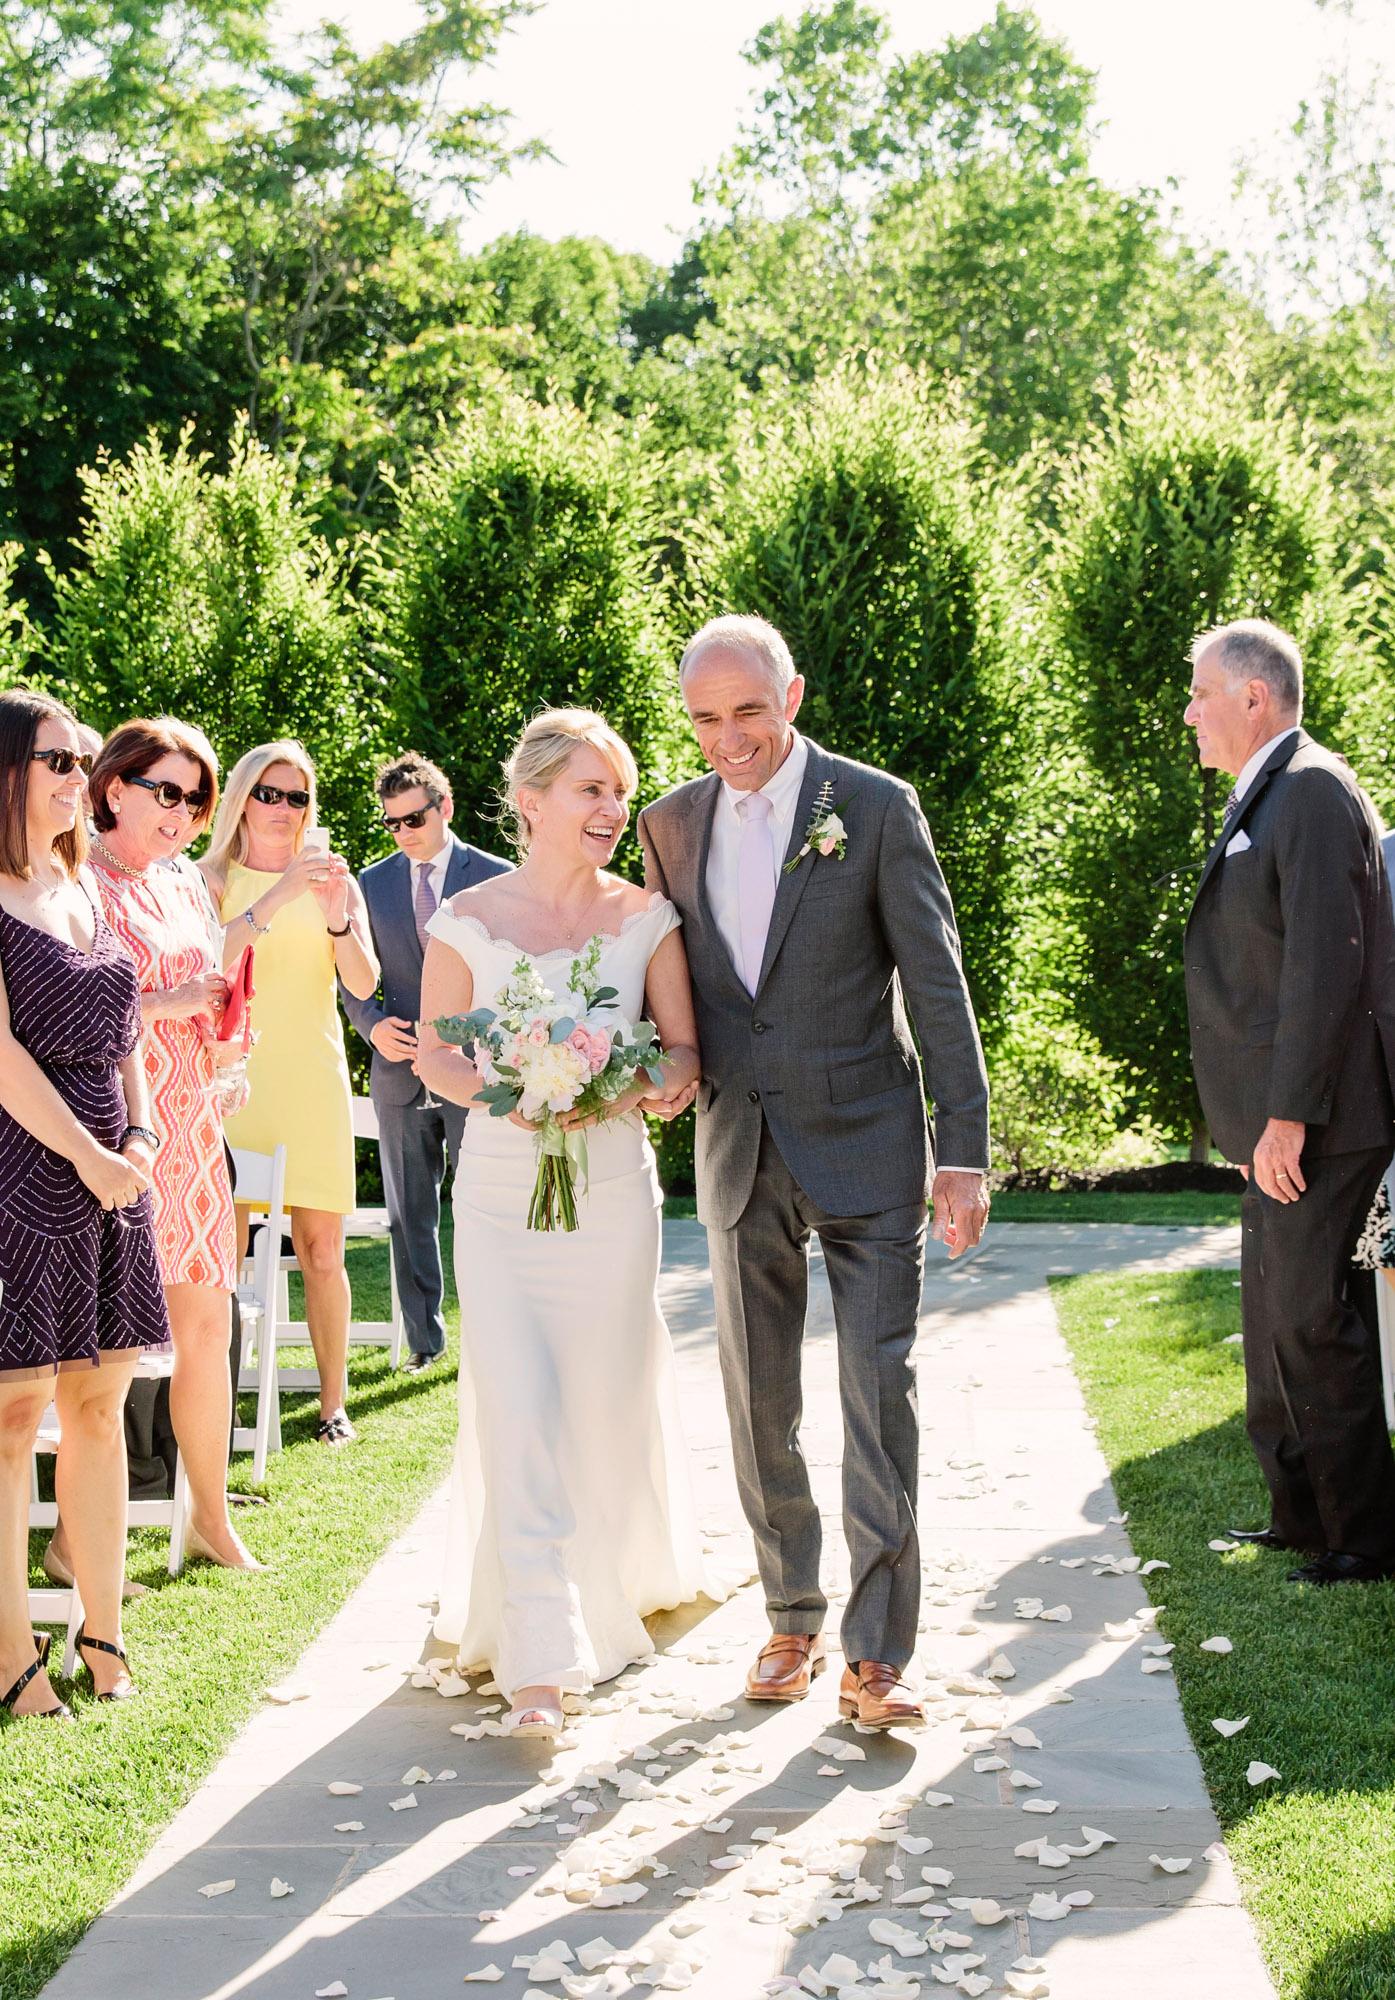 43_Rowan_Brian_The_Roundhouse_Wedding_Beacon_NY_Tanya_Salazar_Photography_515.jpg